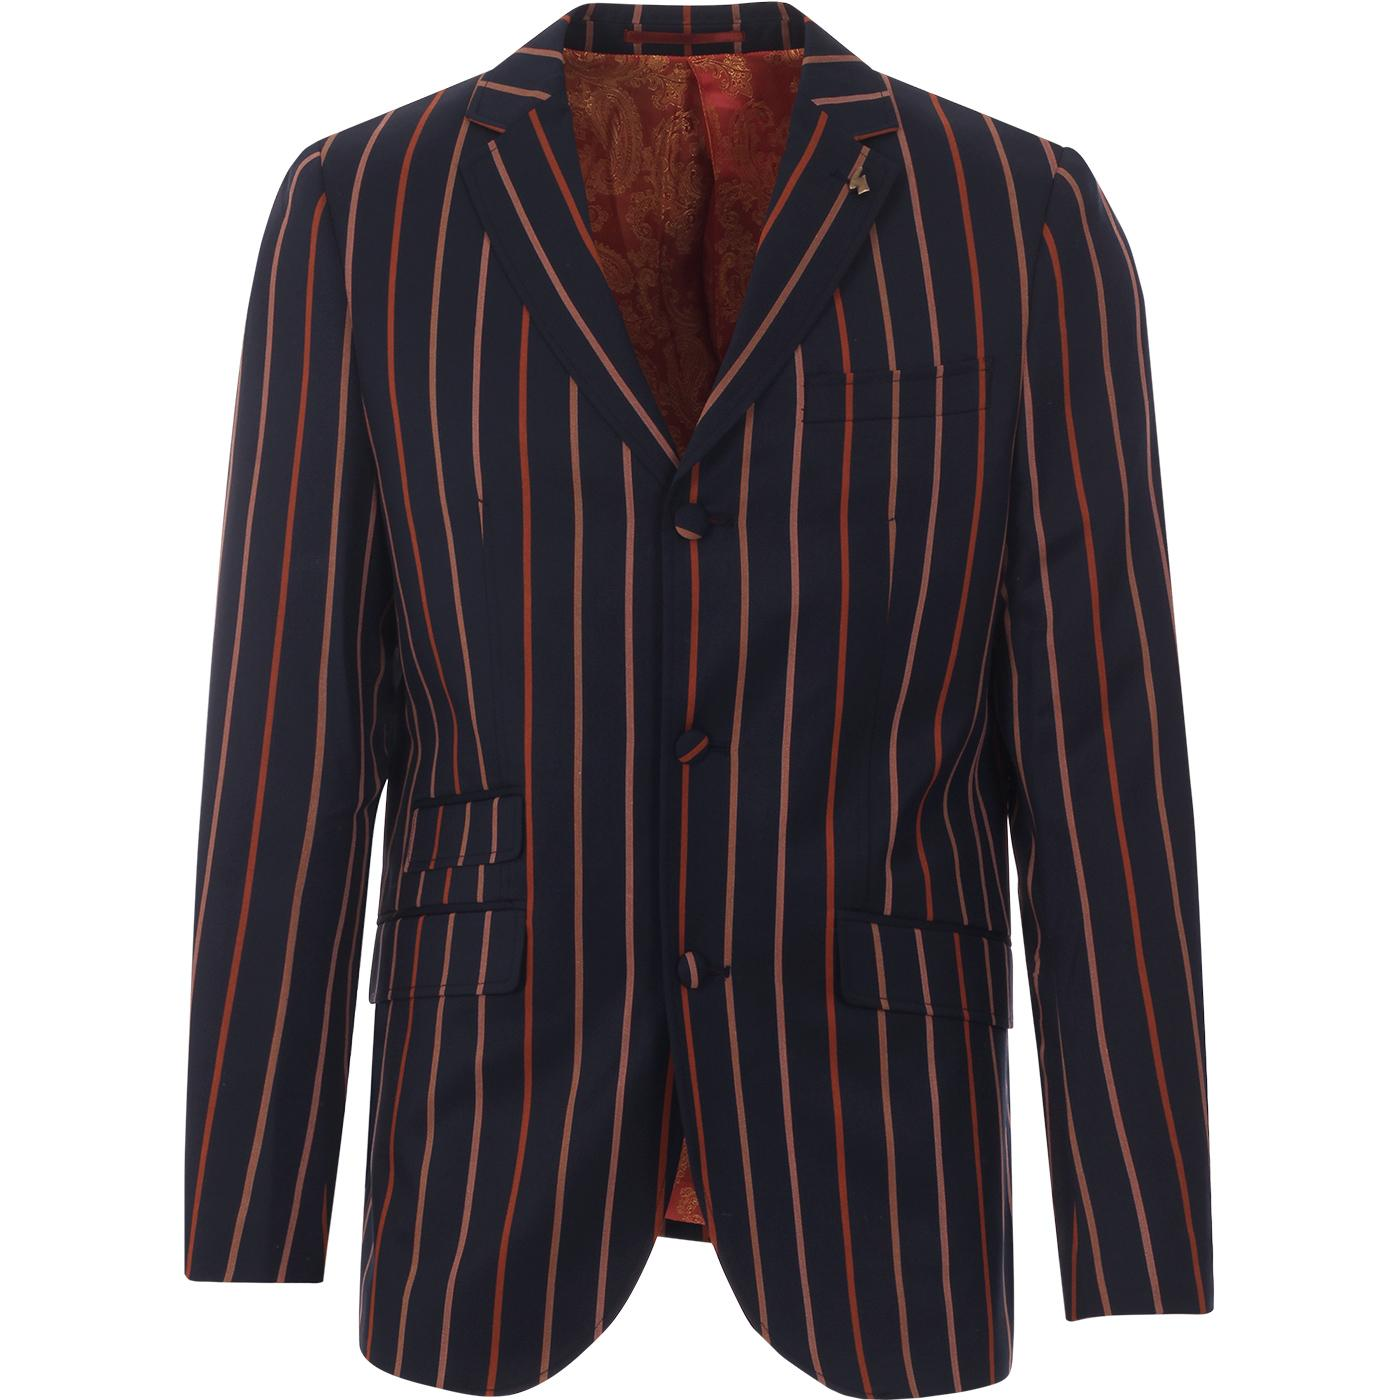 Keeko GABICCI VINTAGE 60s Mod Stripe Blazer (Navy)